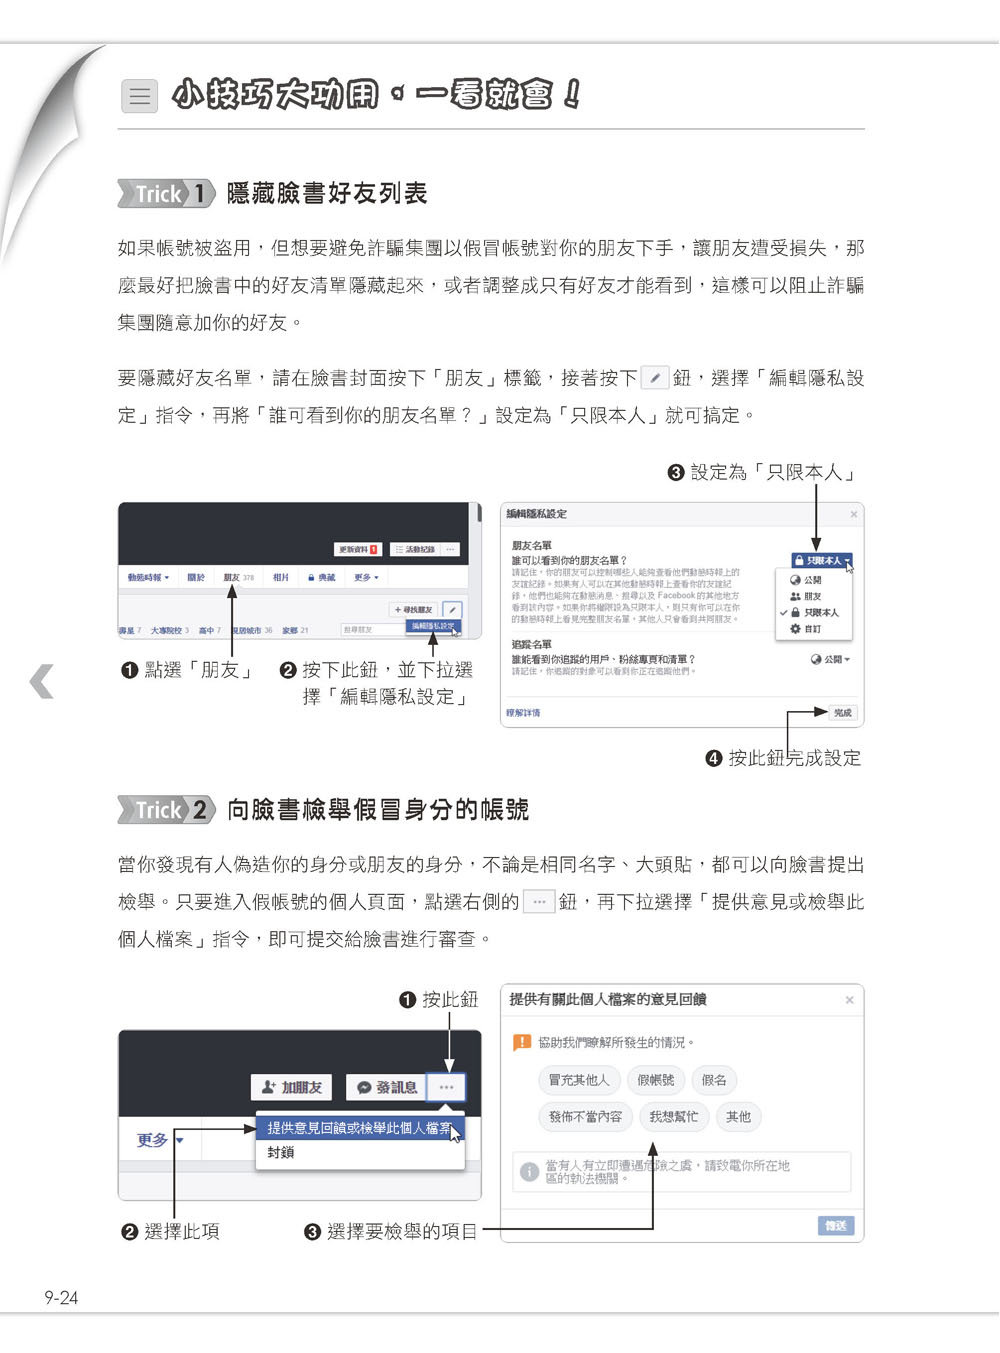 Facebook 互動行銷:社群口碑經營新思路+廣告投放如何有成效,想做好臉書行銷,操作心法就在這!-preview-26